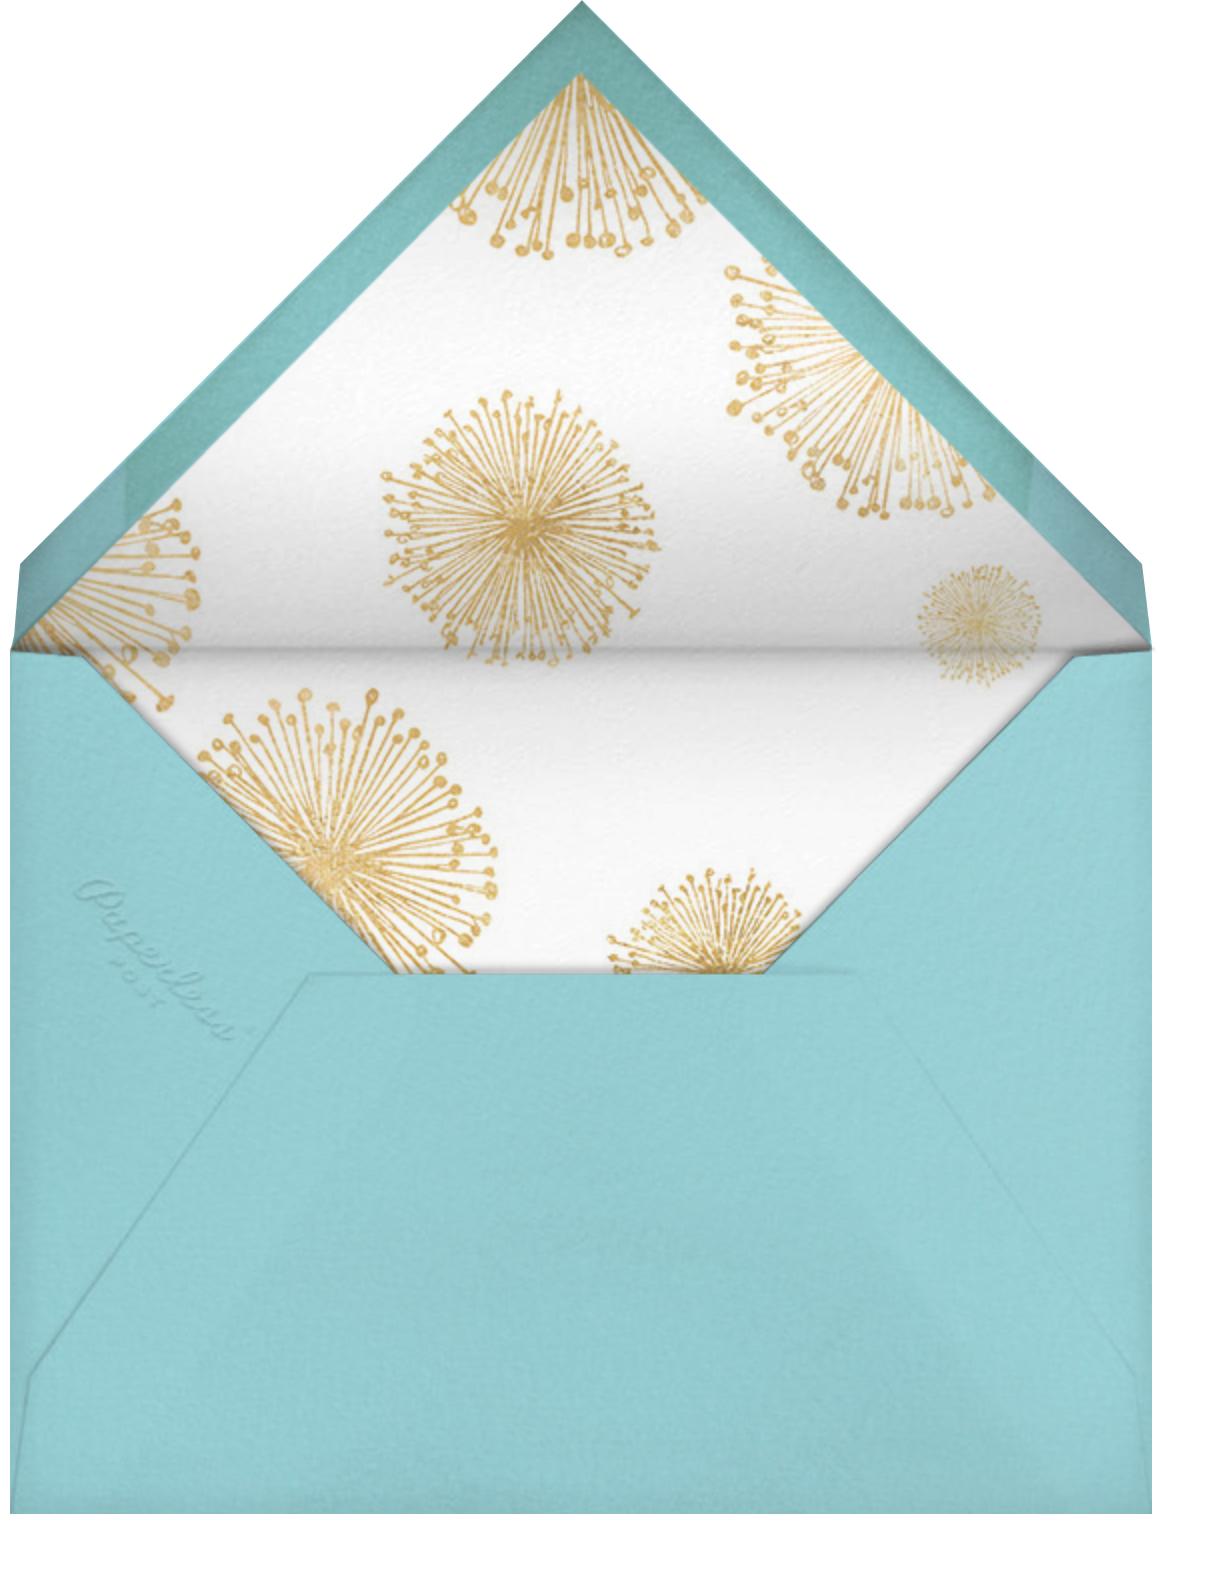 Dandelion (Invitation) - White/Gold - Paperless Post - Memorial service - envelope back